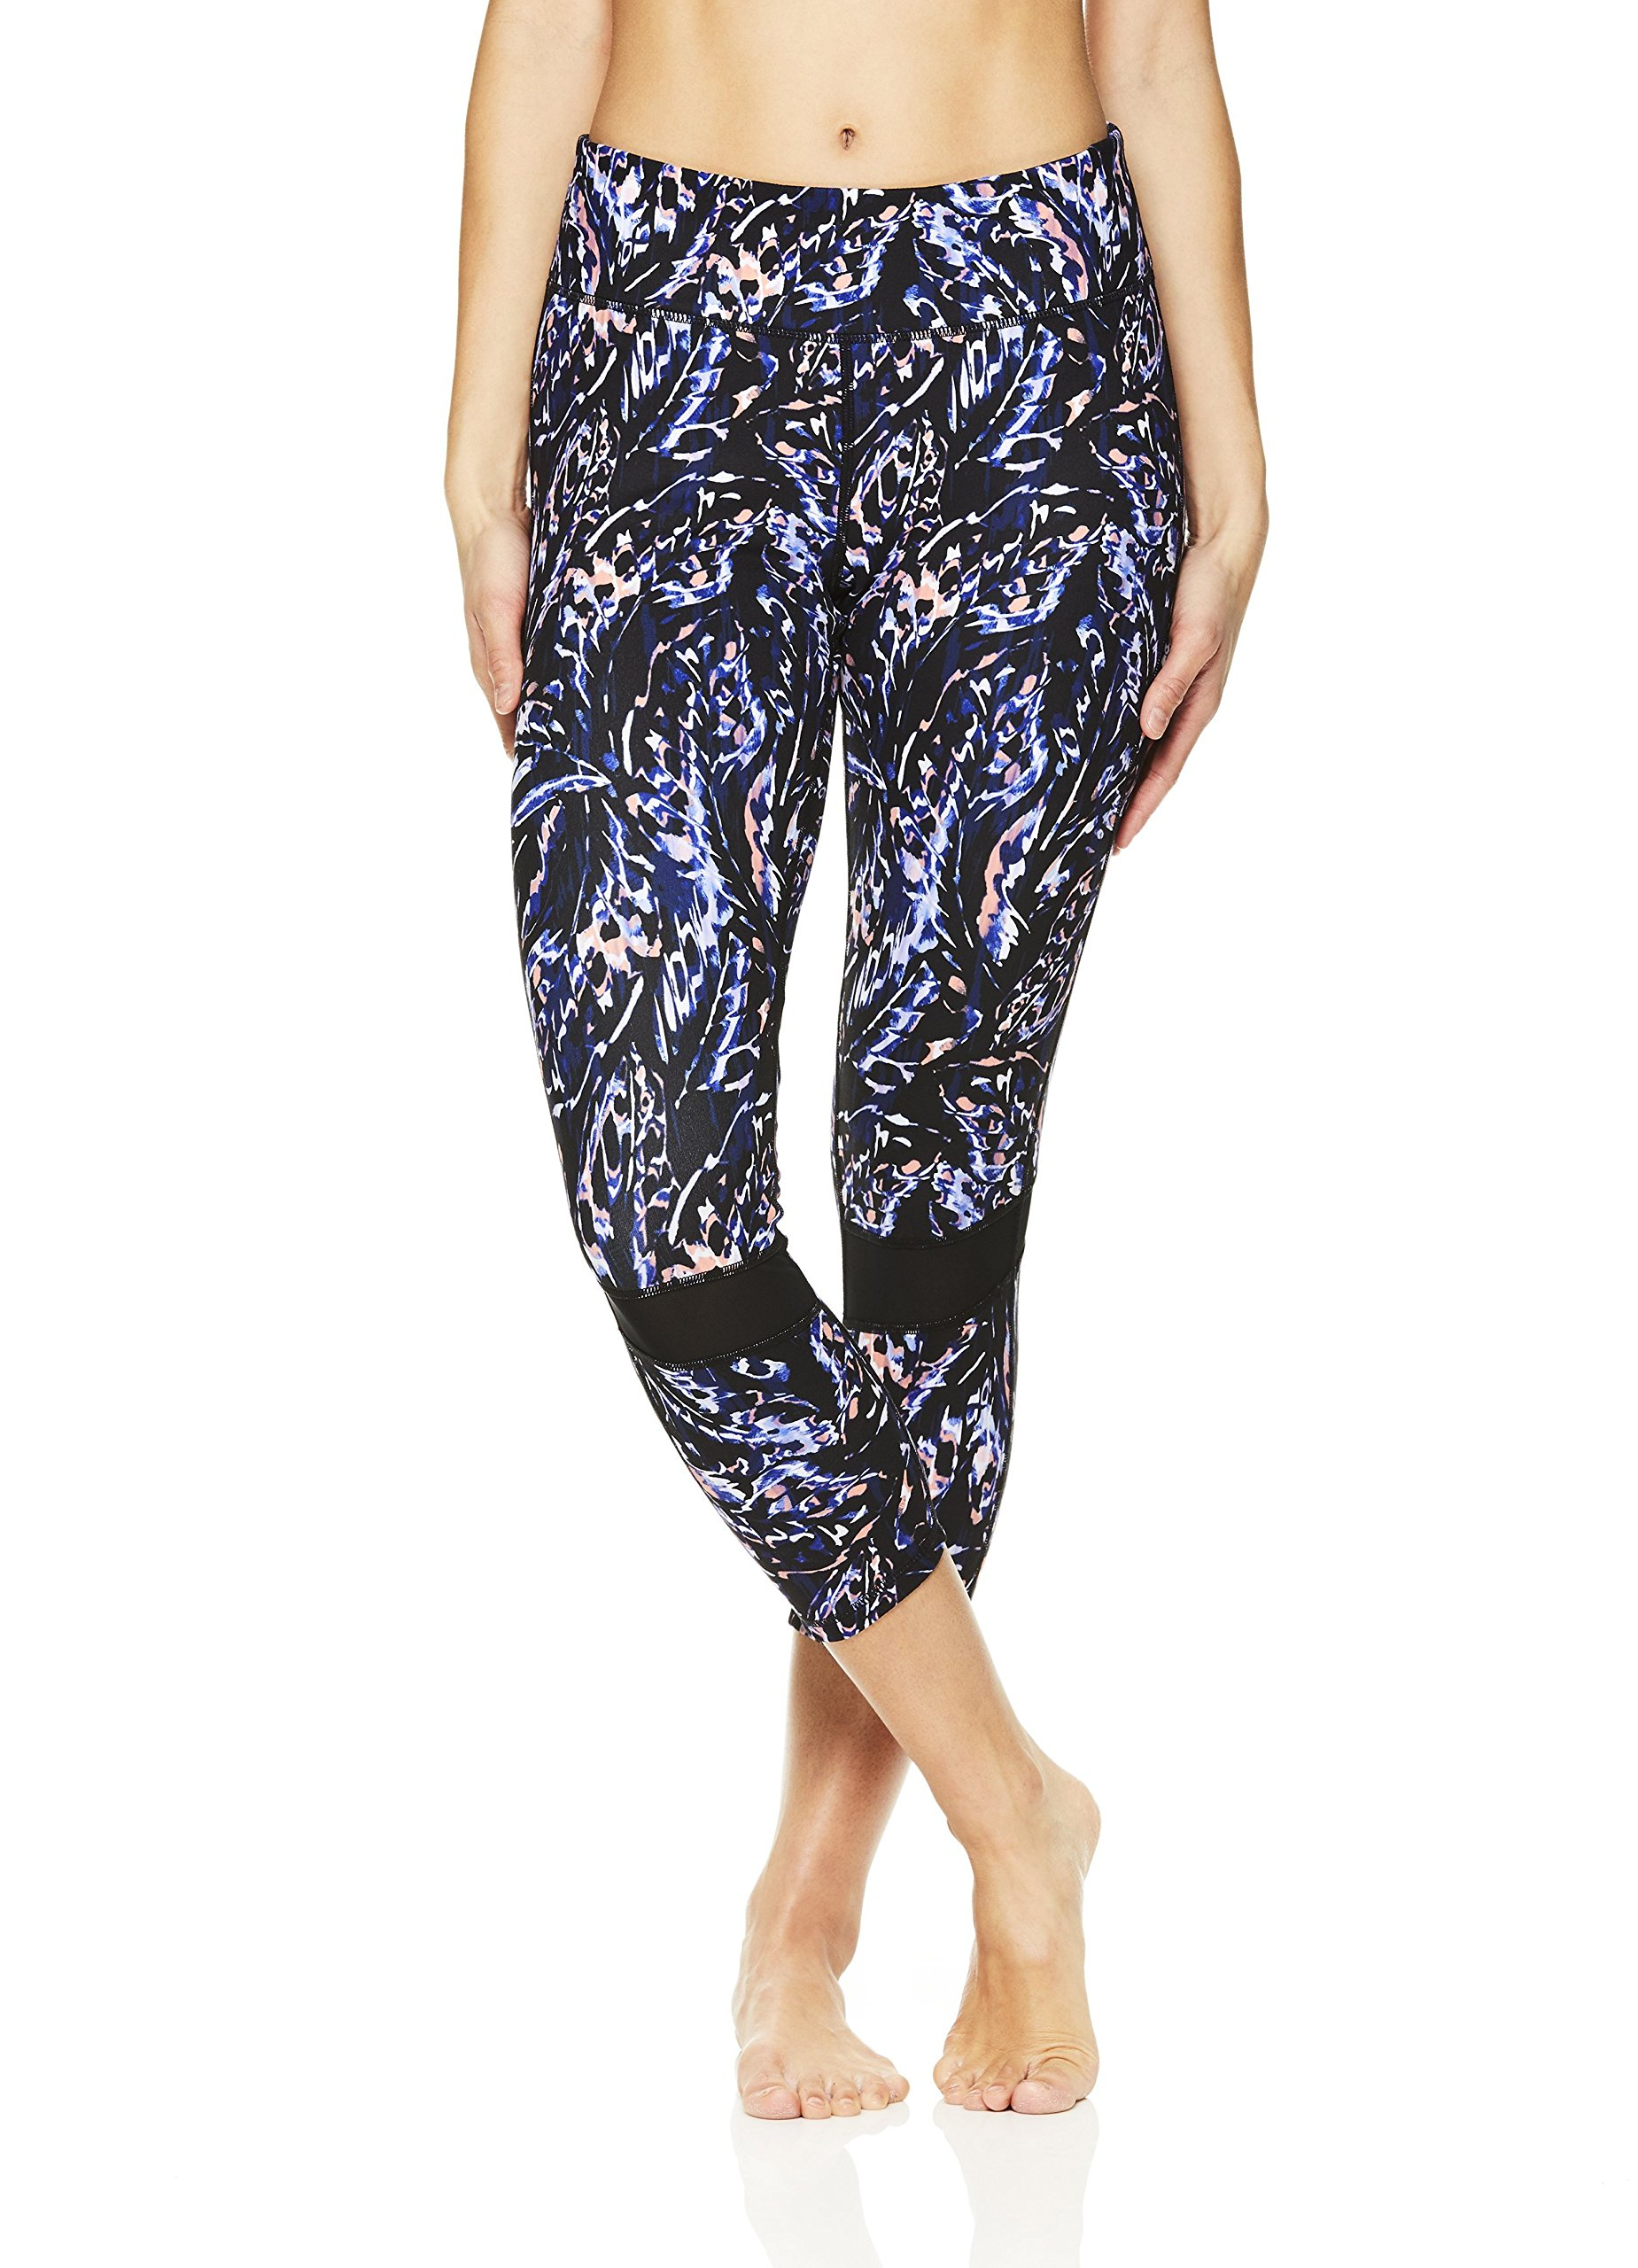 Gaiam Women's Capri Yoga Pants - Performance Spandex Compression Legging - Black (Tap Shoe), X-Small